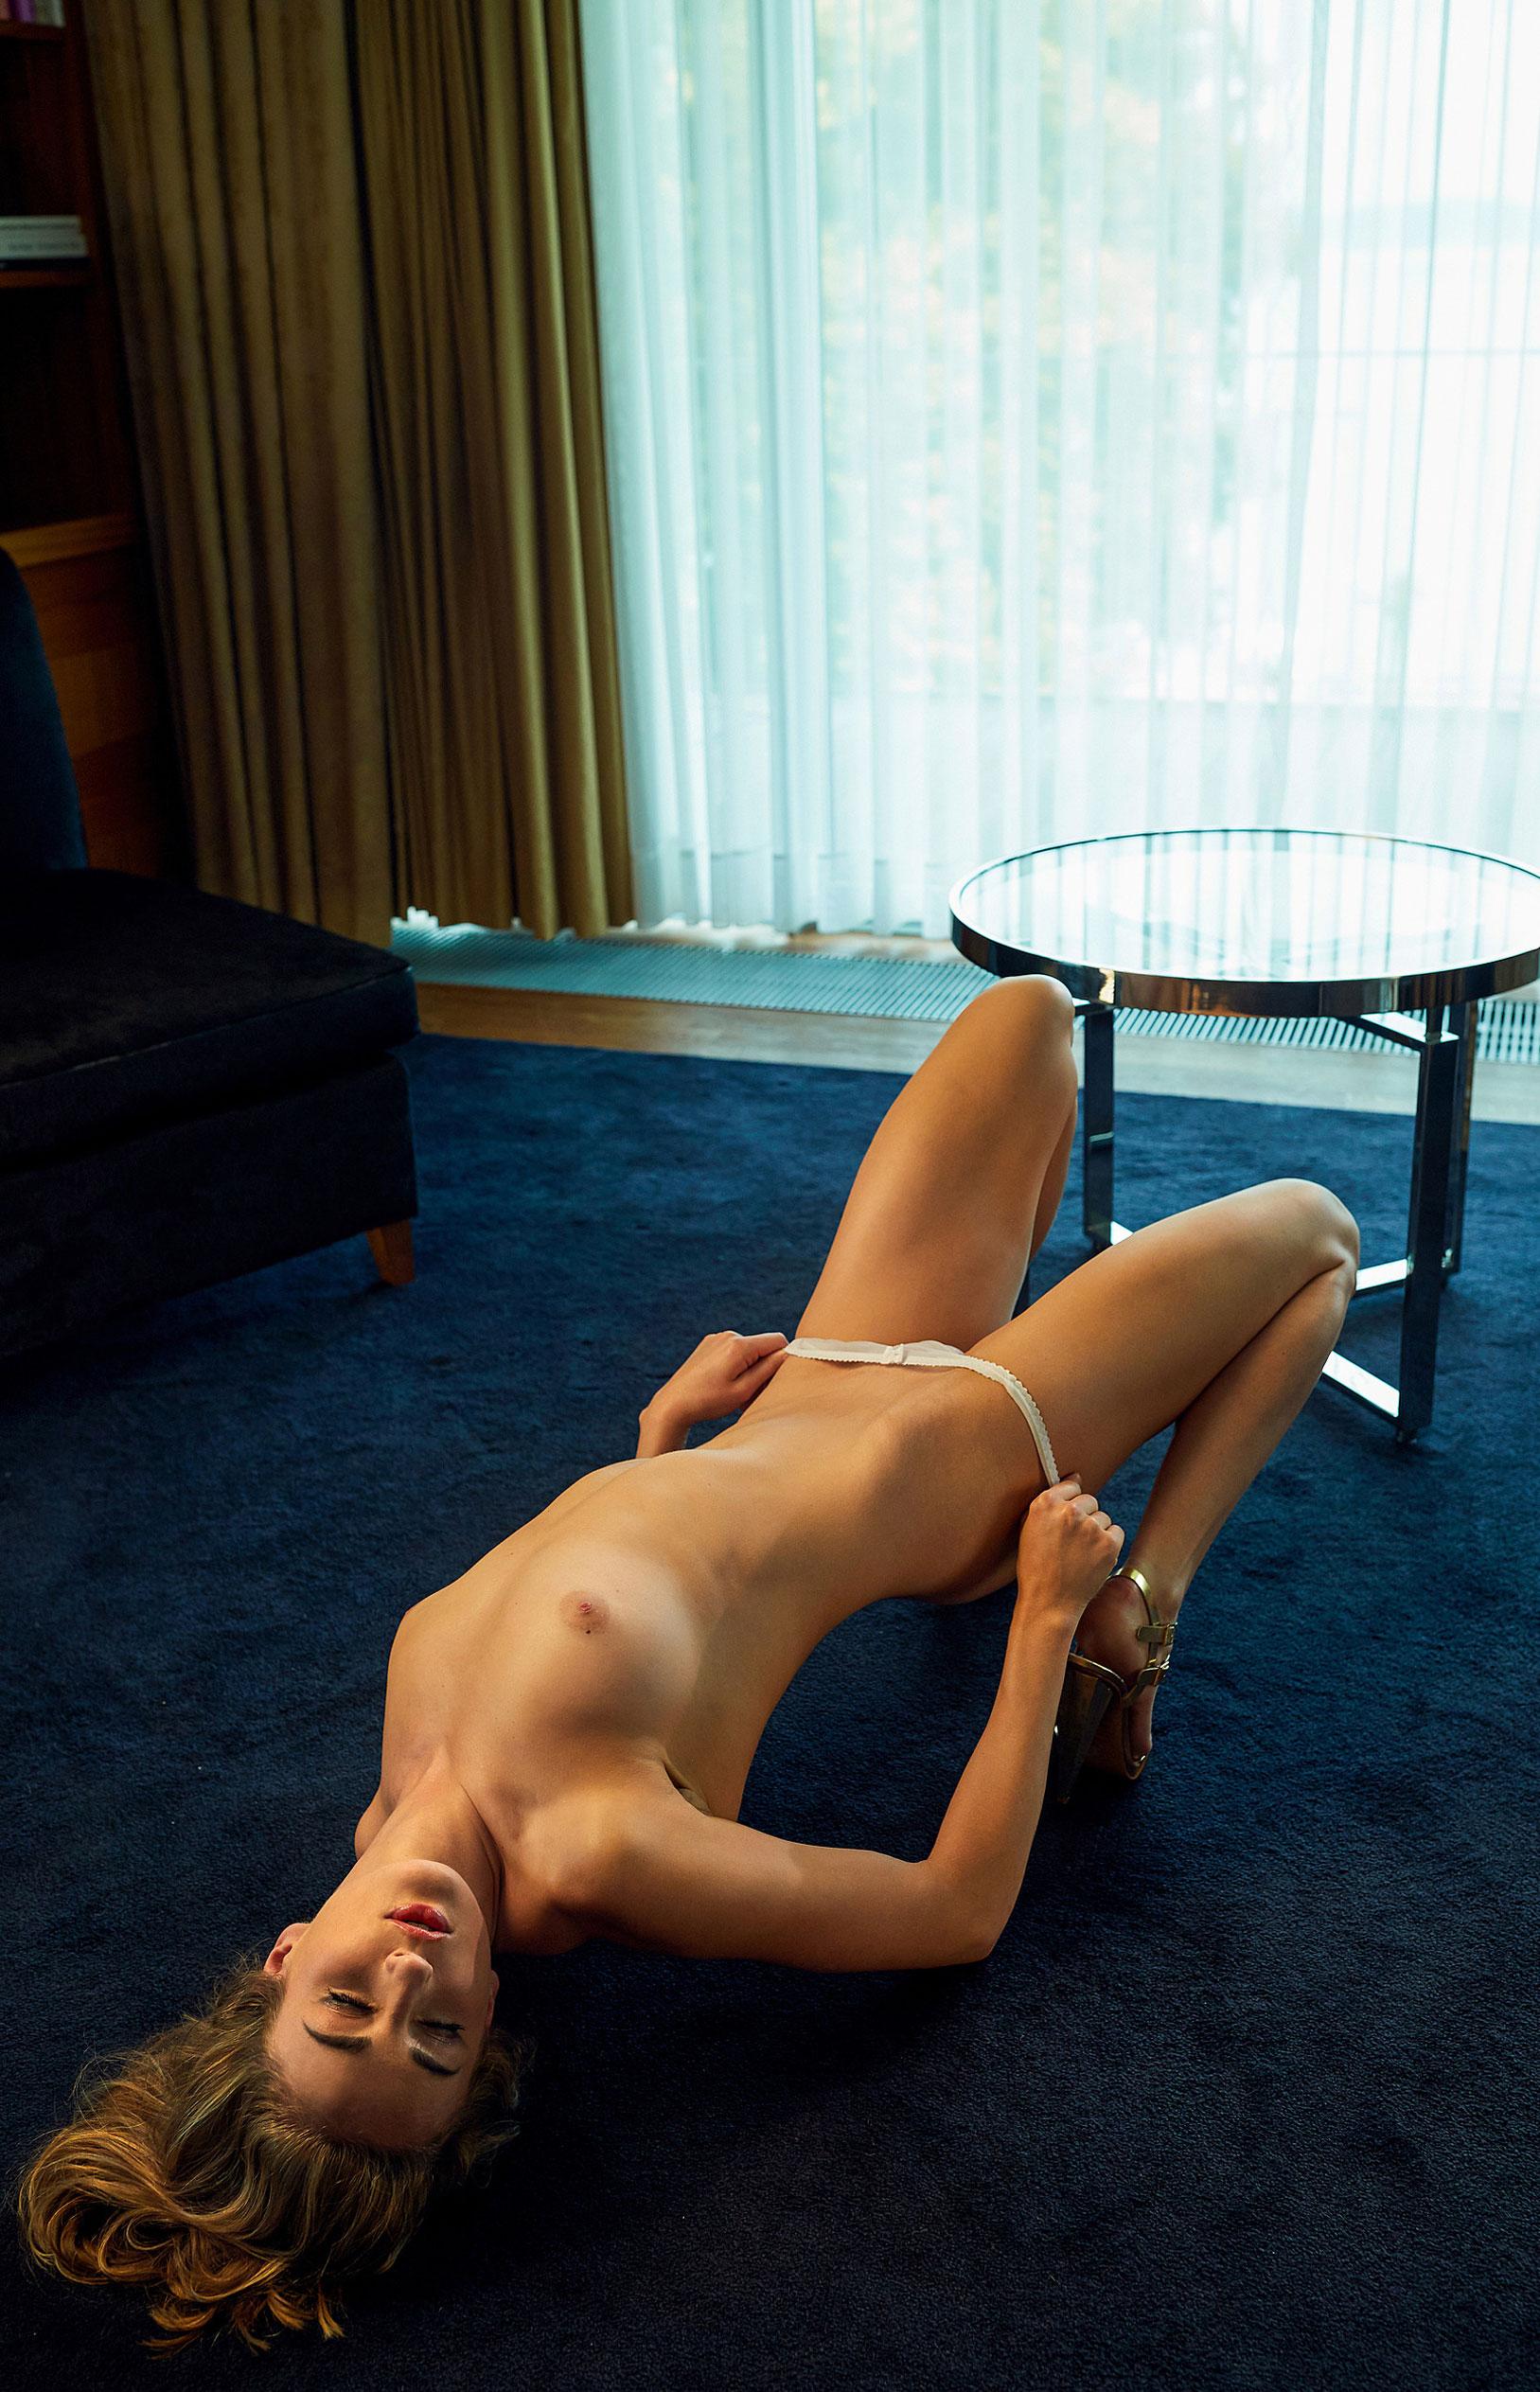 пловчиха Елена Кравцова в журнале Playboy Германия, октябрь 2020 / фото 03